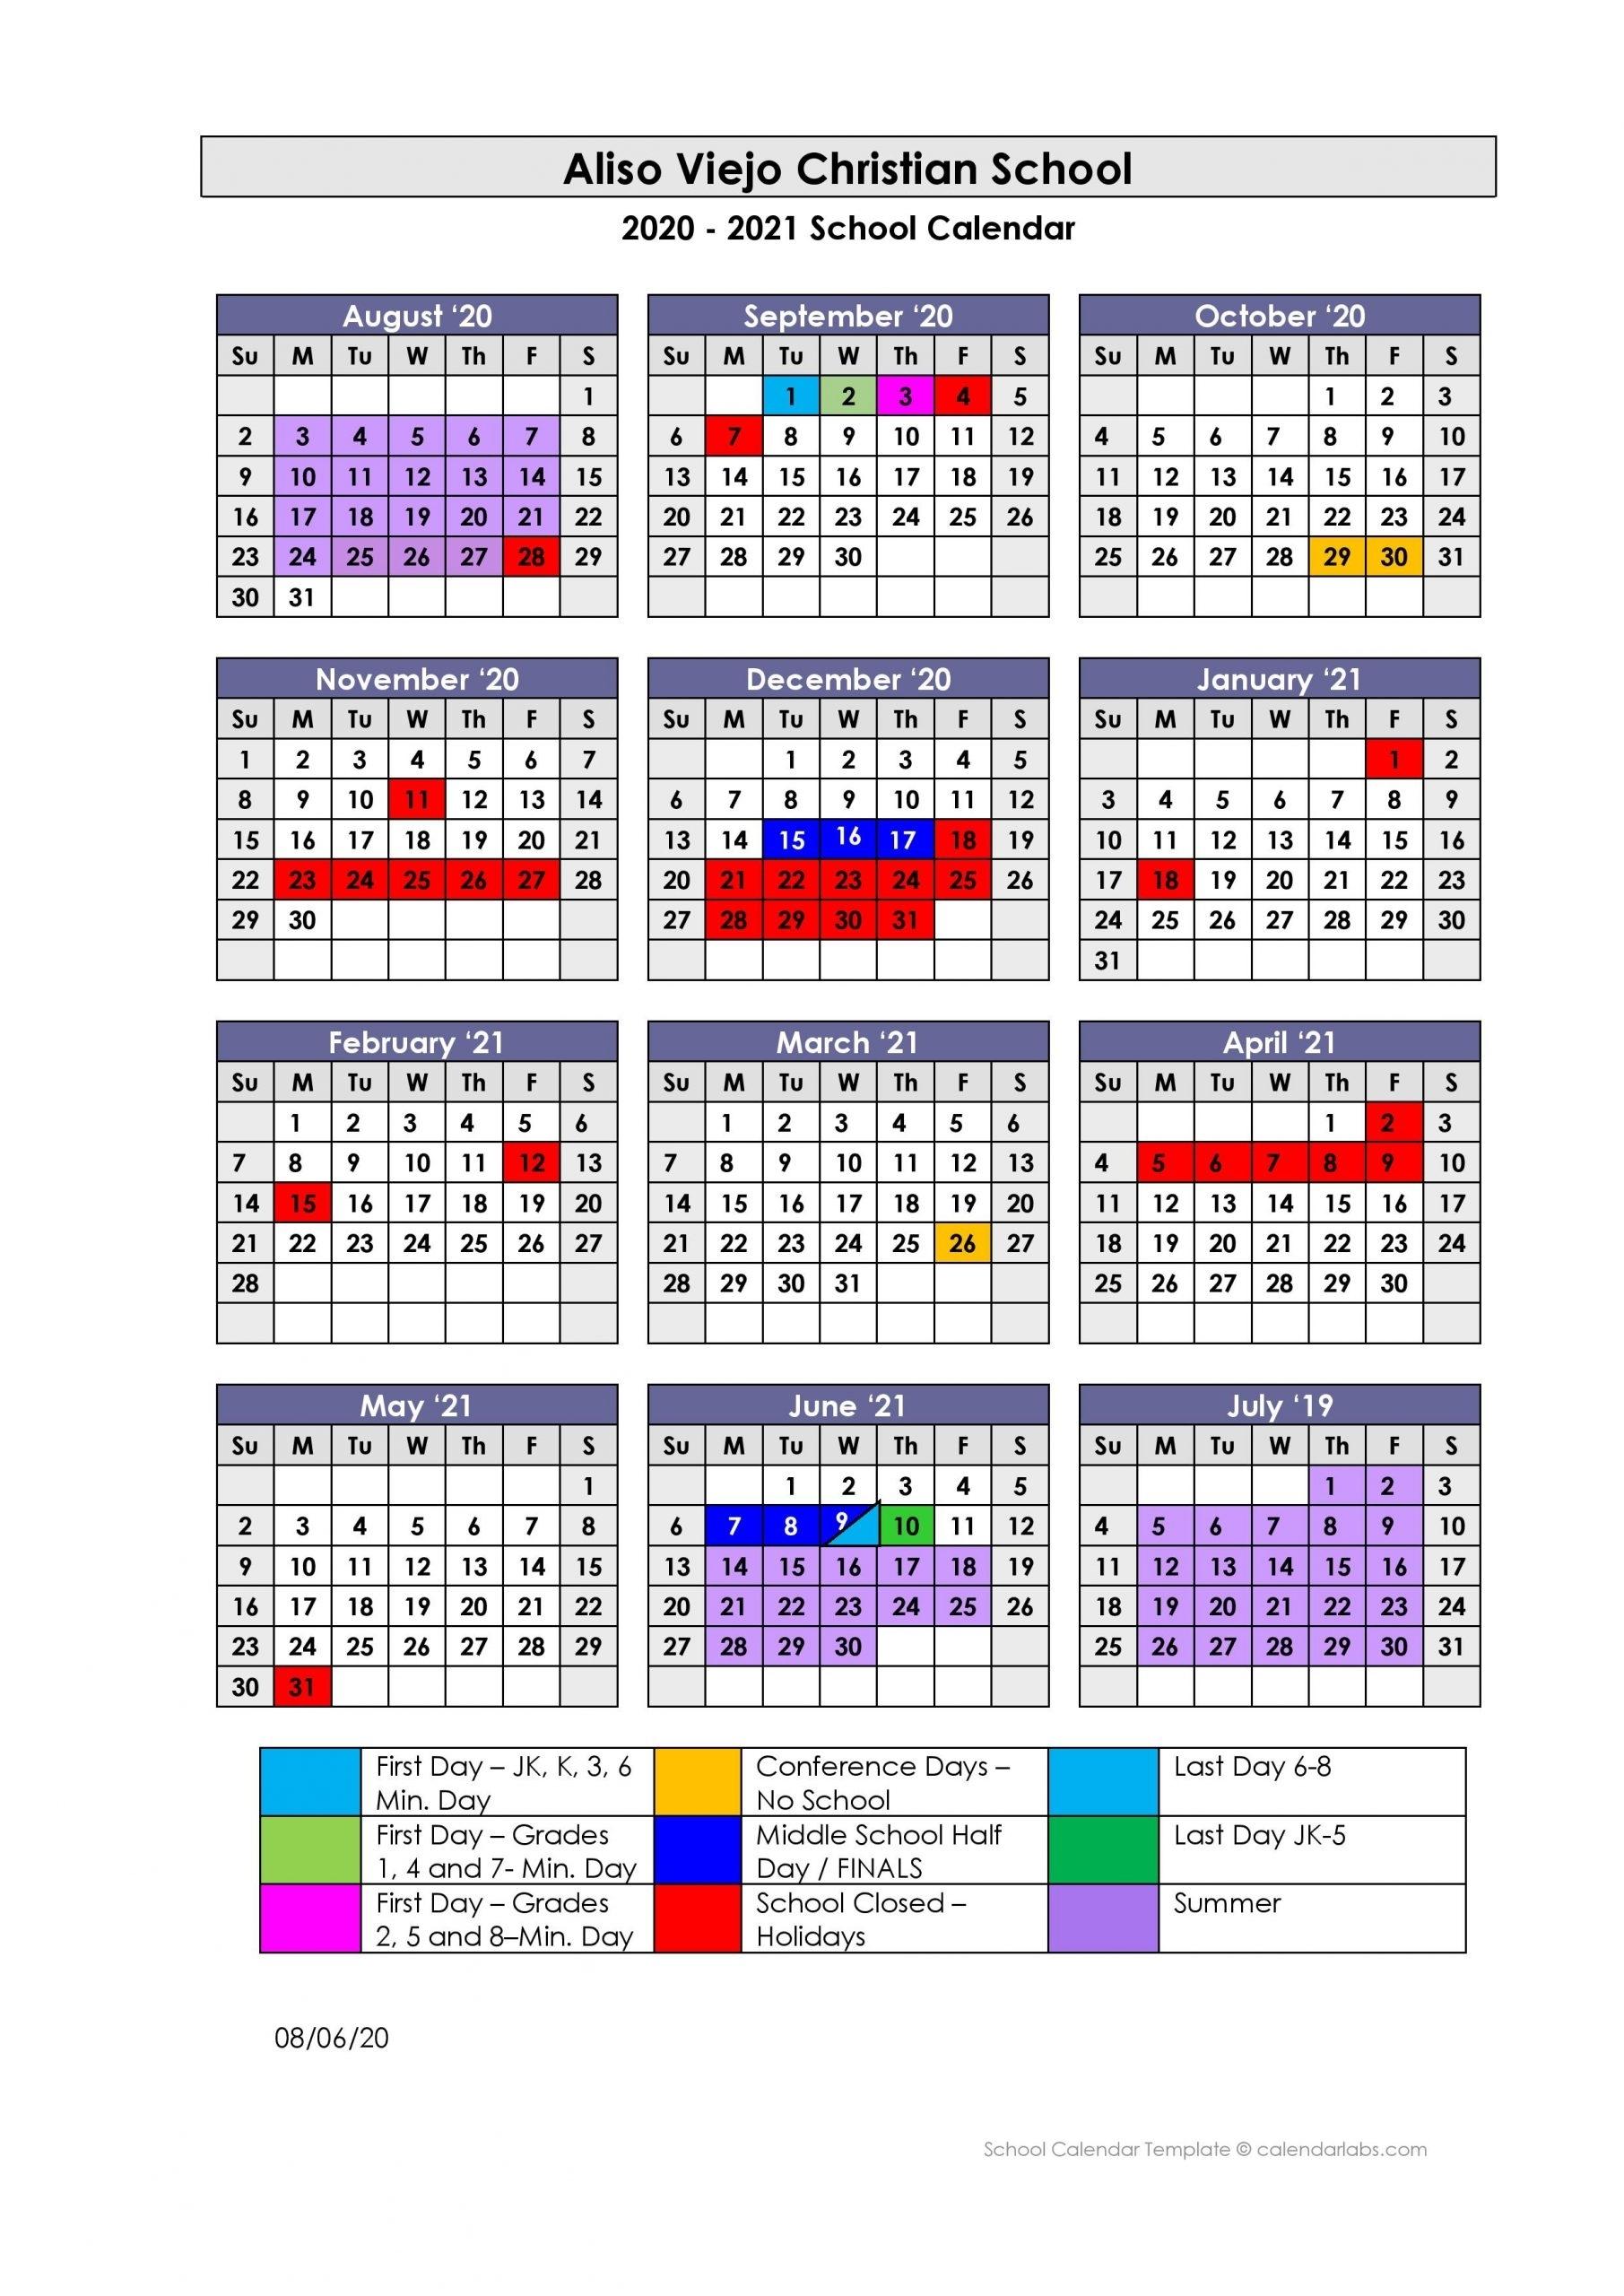 2020 - 2021 School Calendar - Aliso Viejo Christian School